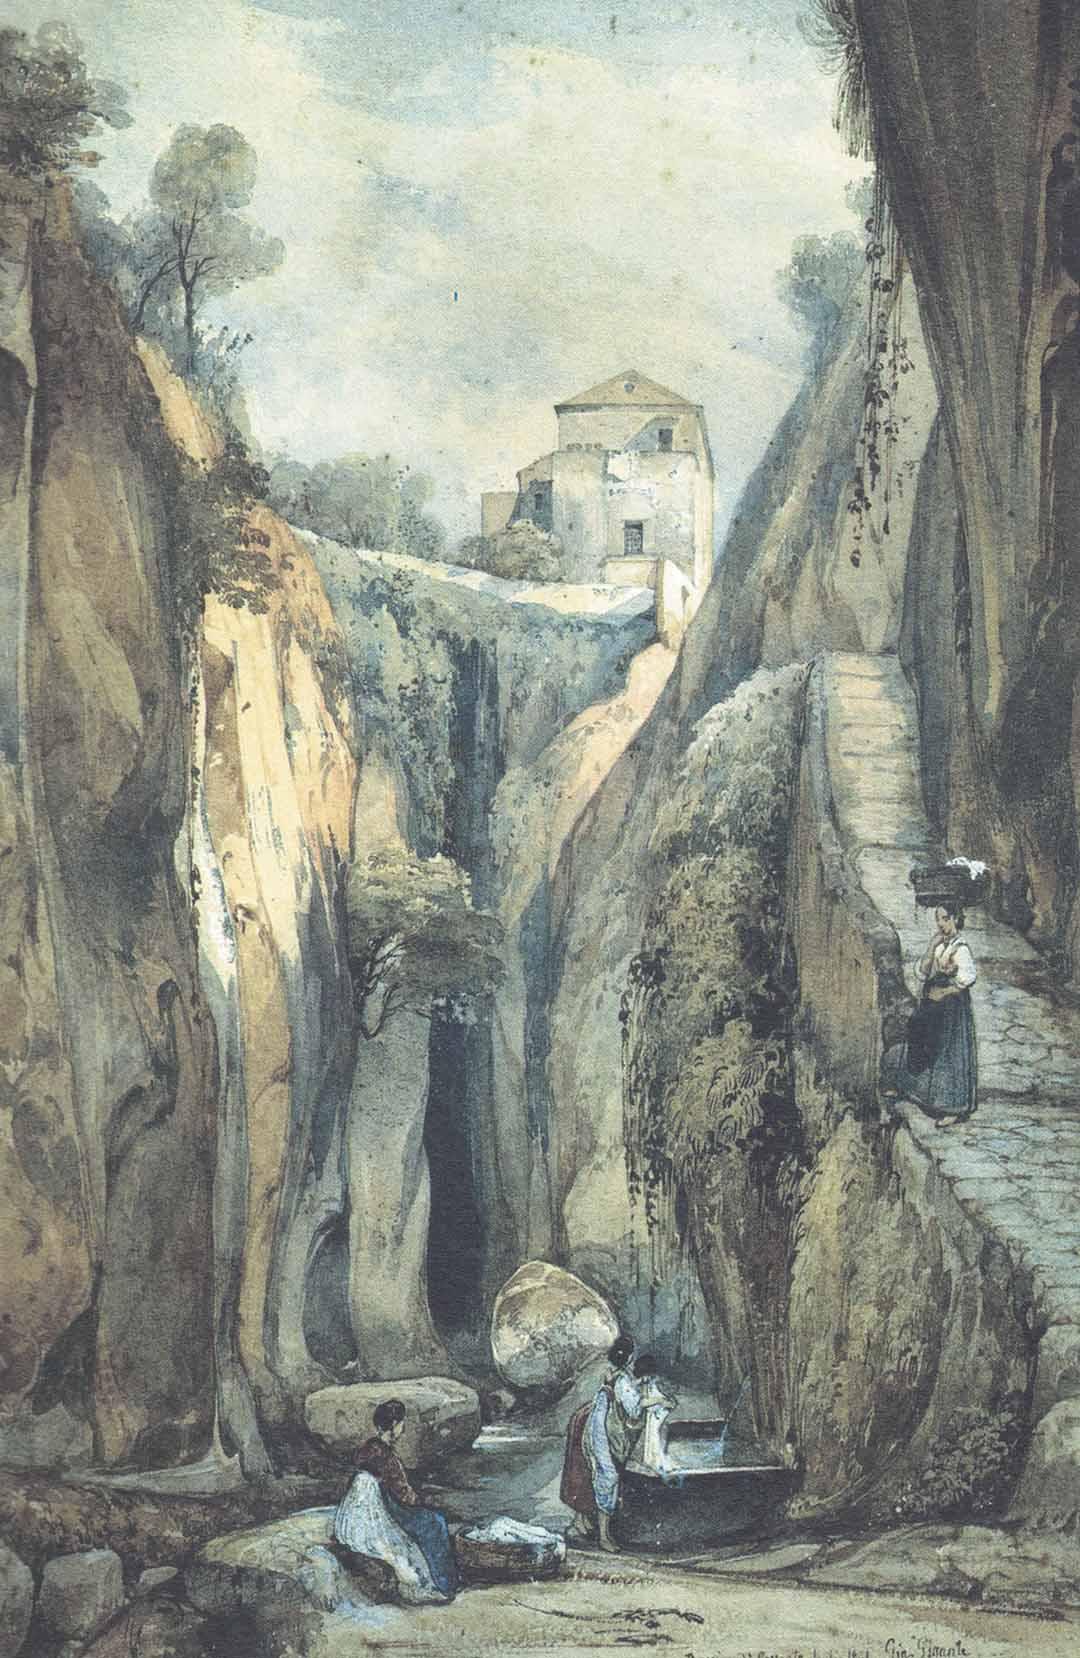 Giacinto GIGANTE (Napoli 1806 – Napoli 1876), Ravine di Sorrento, July 1841